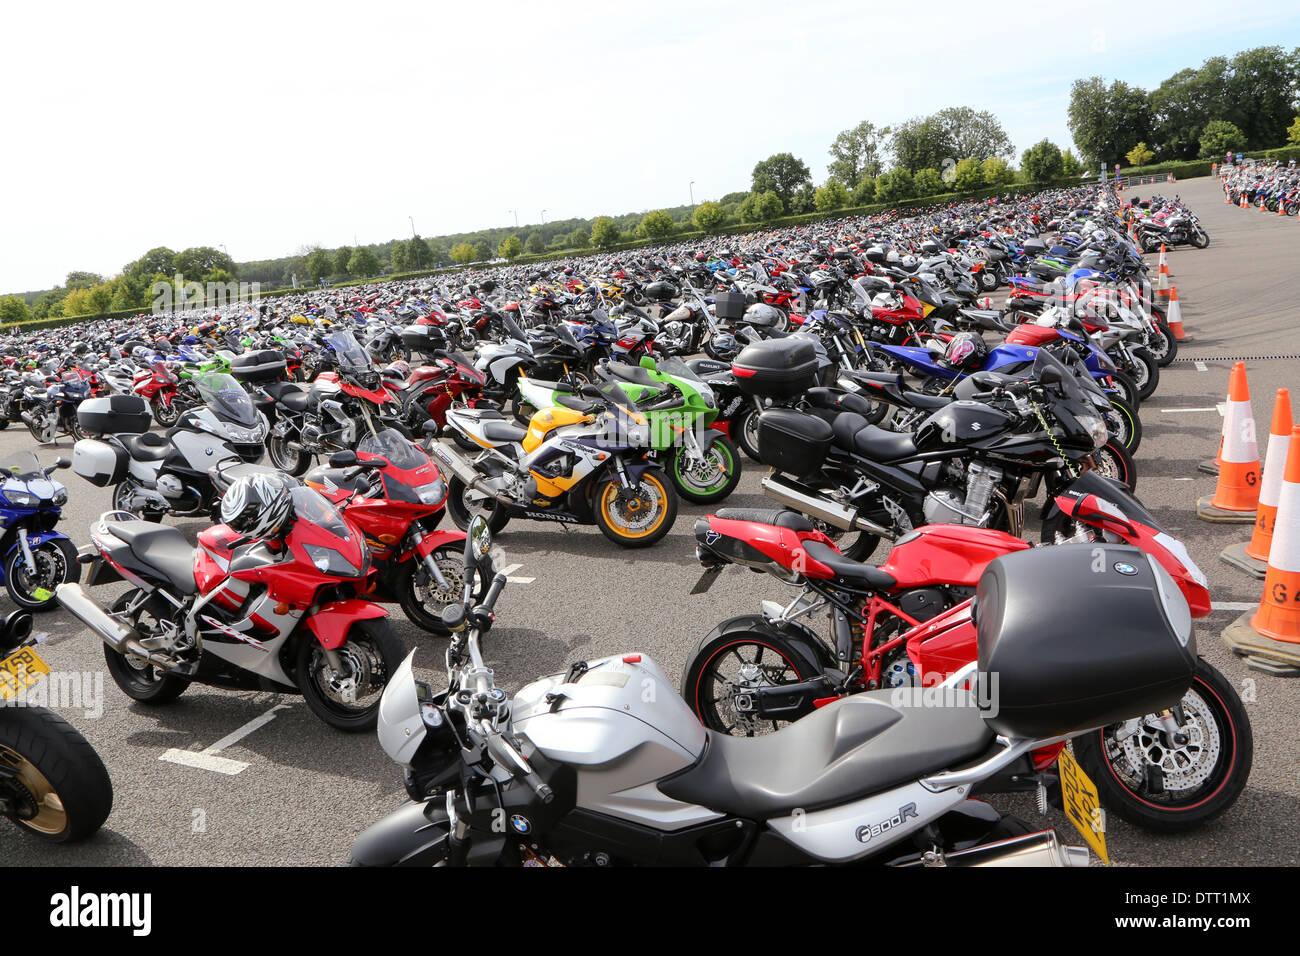 Bike Park At Silverstone Moto Gp 2013 Stock Photo Royalty Free